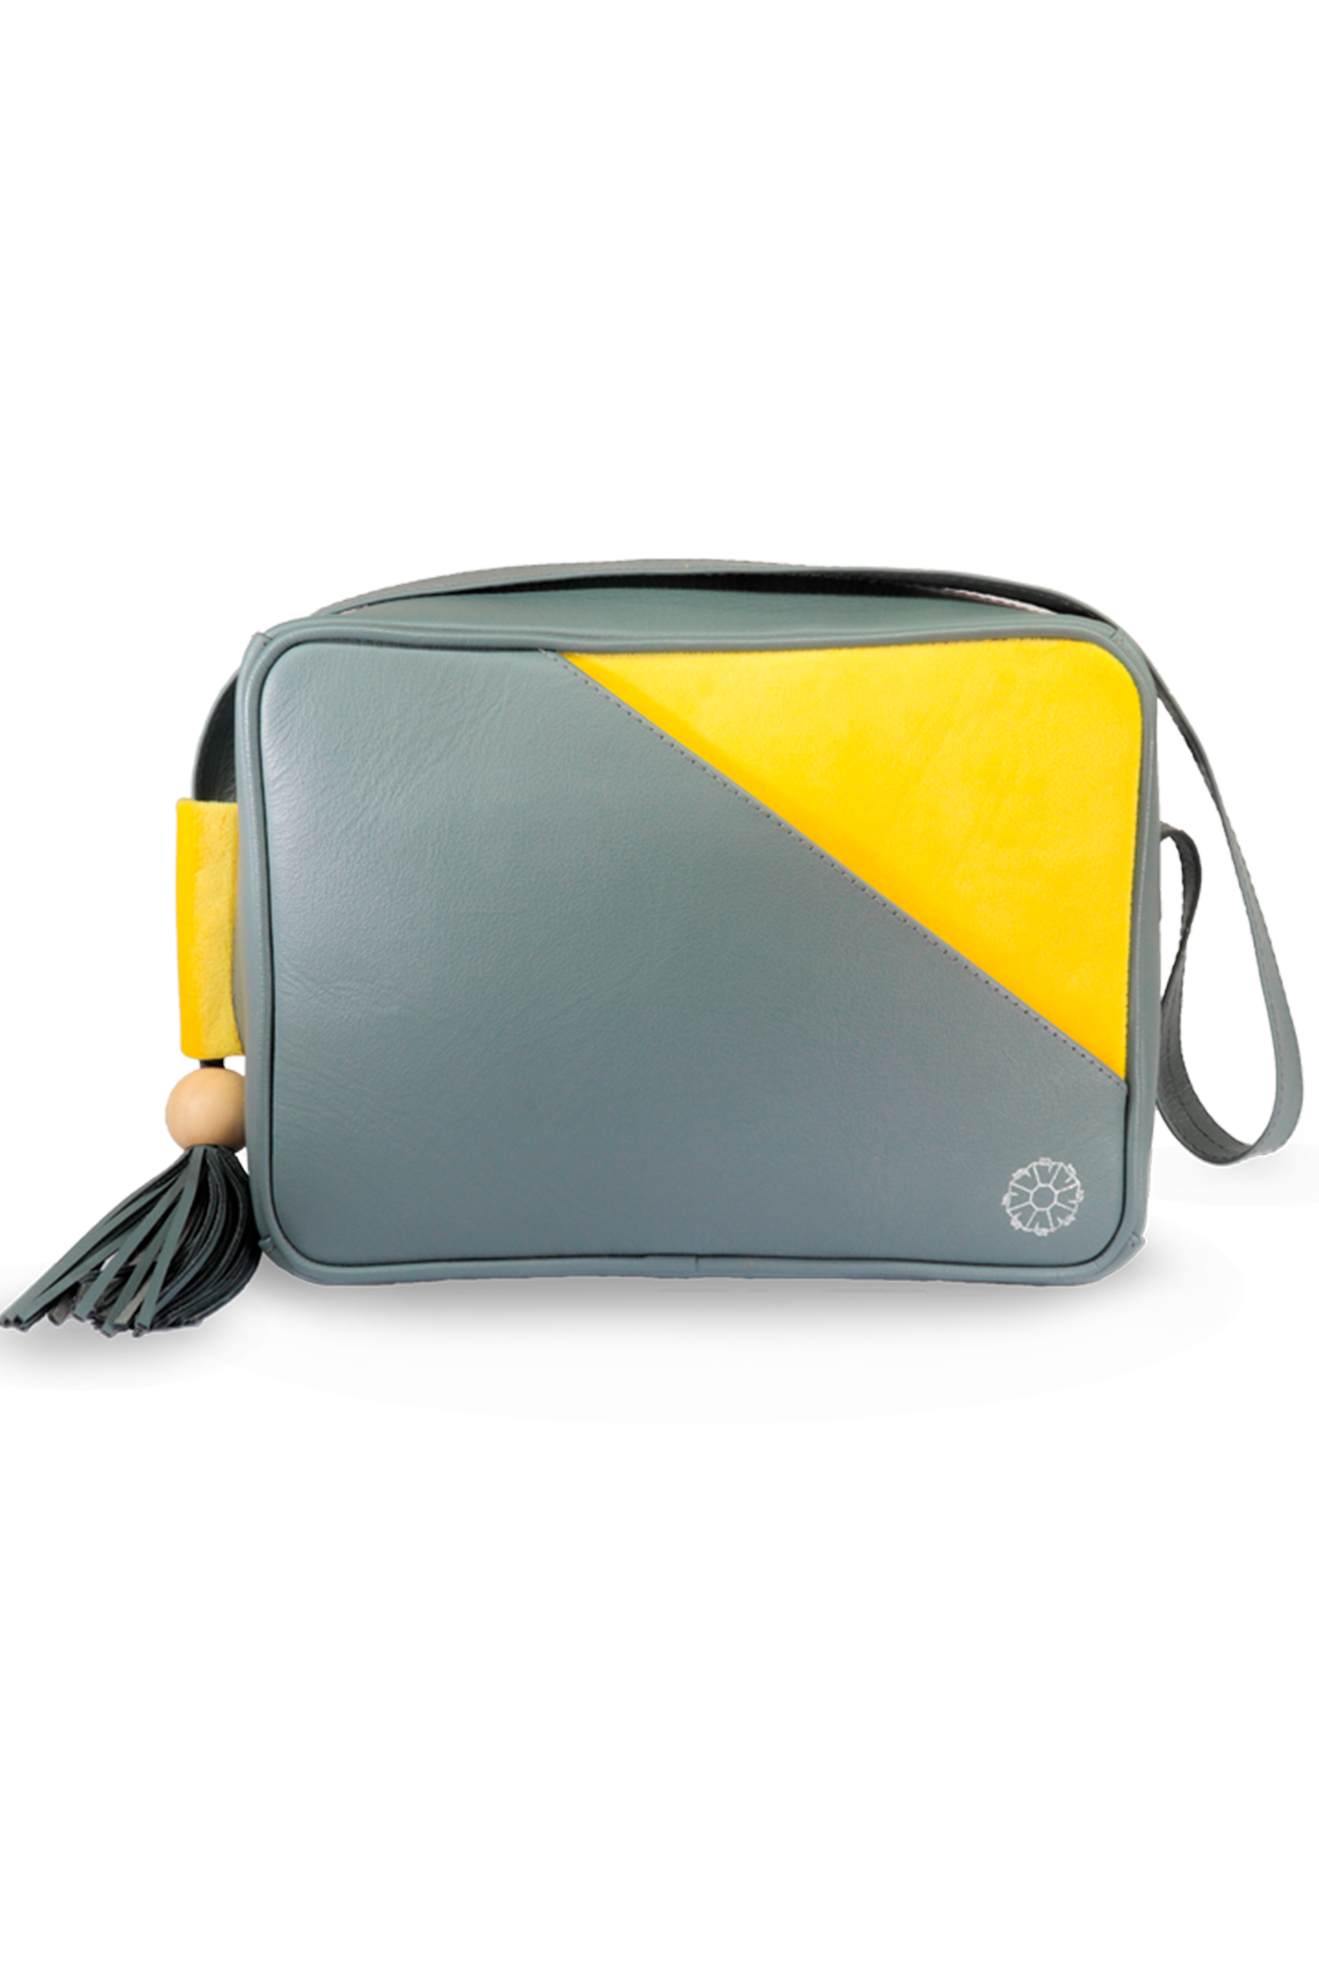 Leather and velvet camara bag